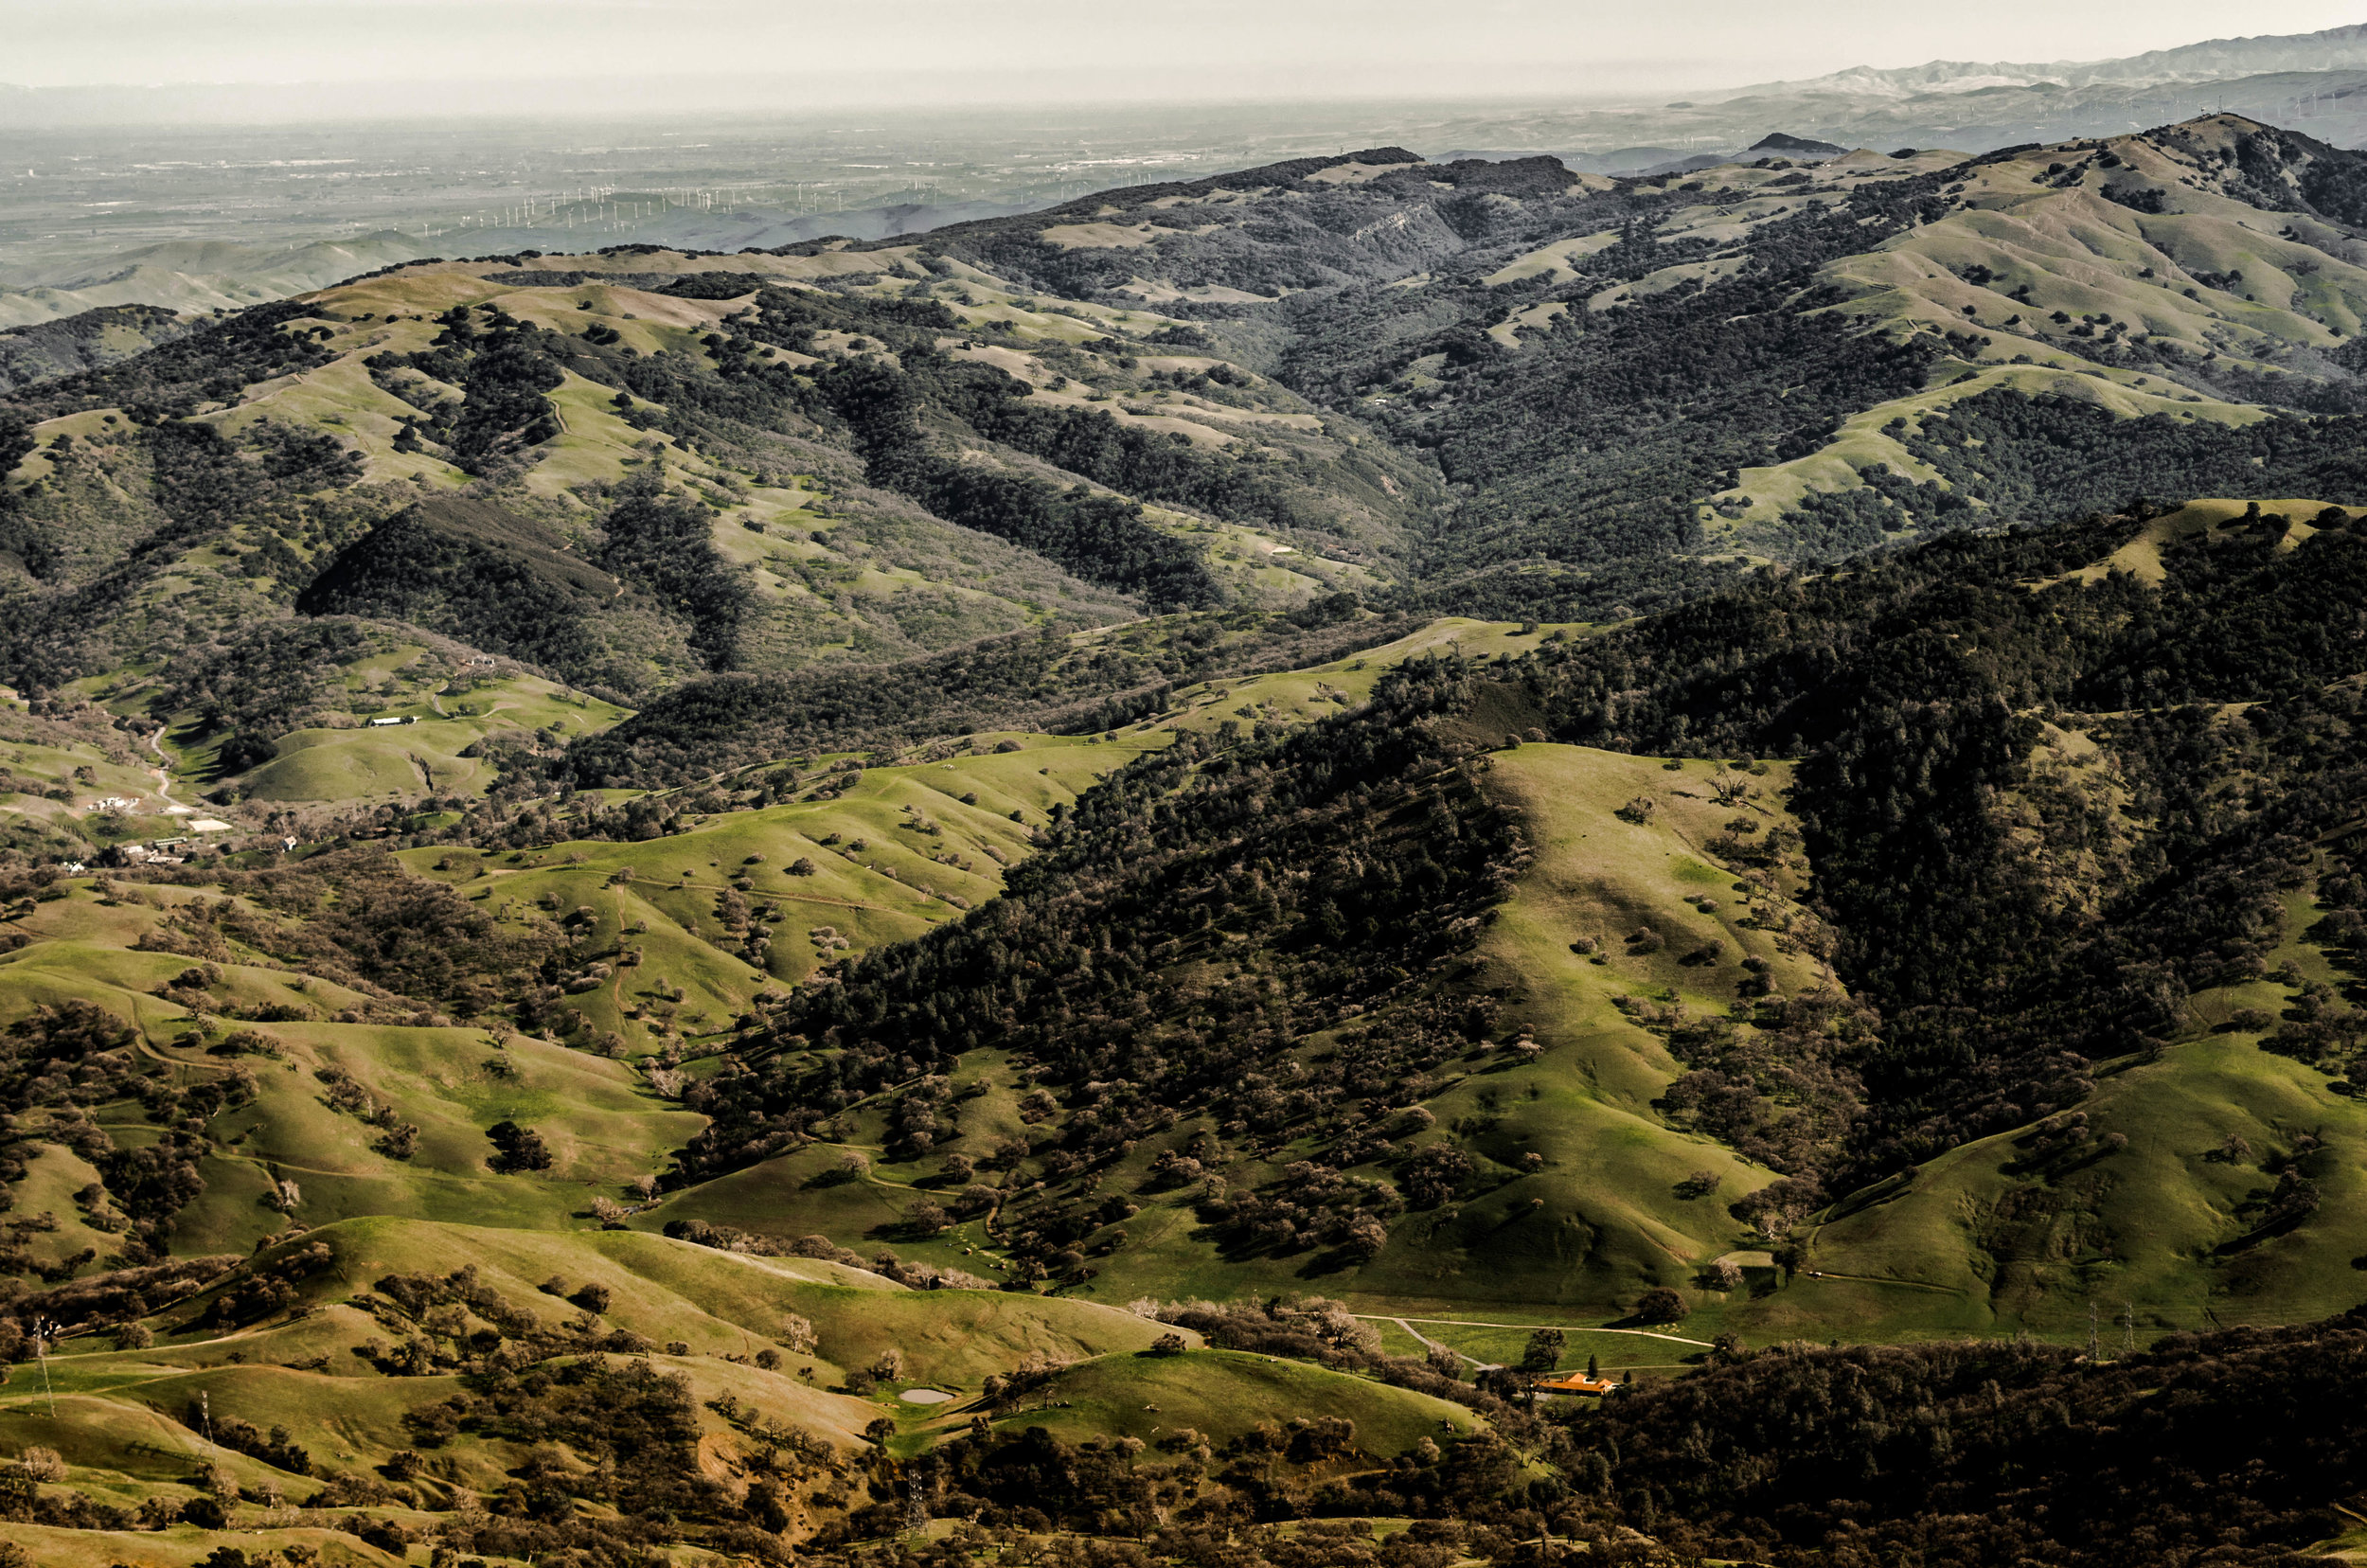 Mt. Diablo, CA, USA